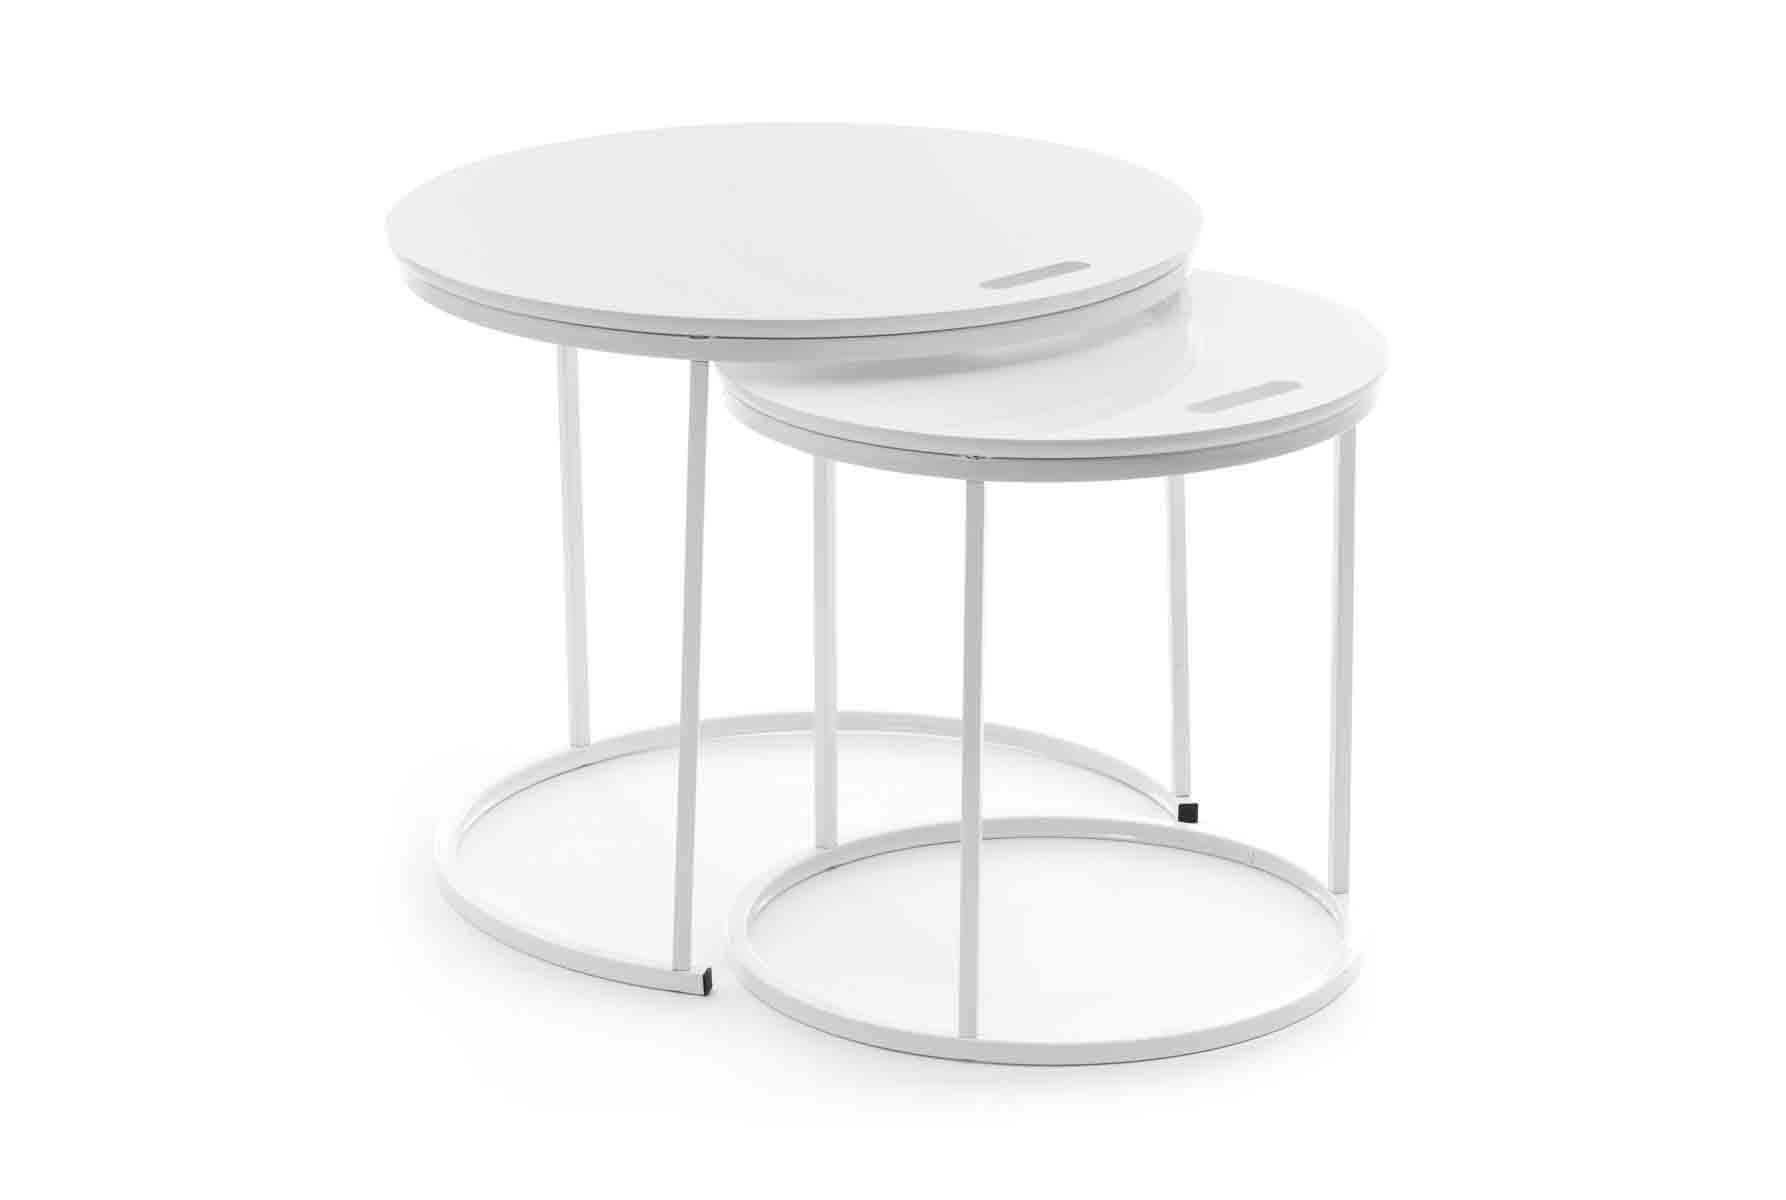 Strakke Witte Sidetable.Sidetable Design Round Wit 2 Stuks